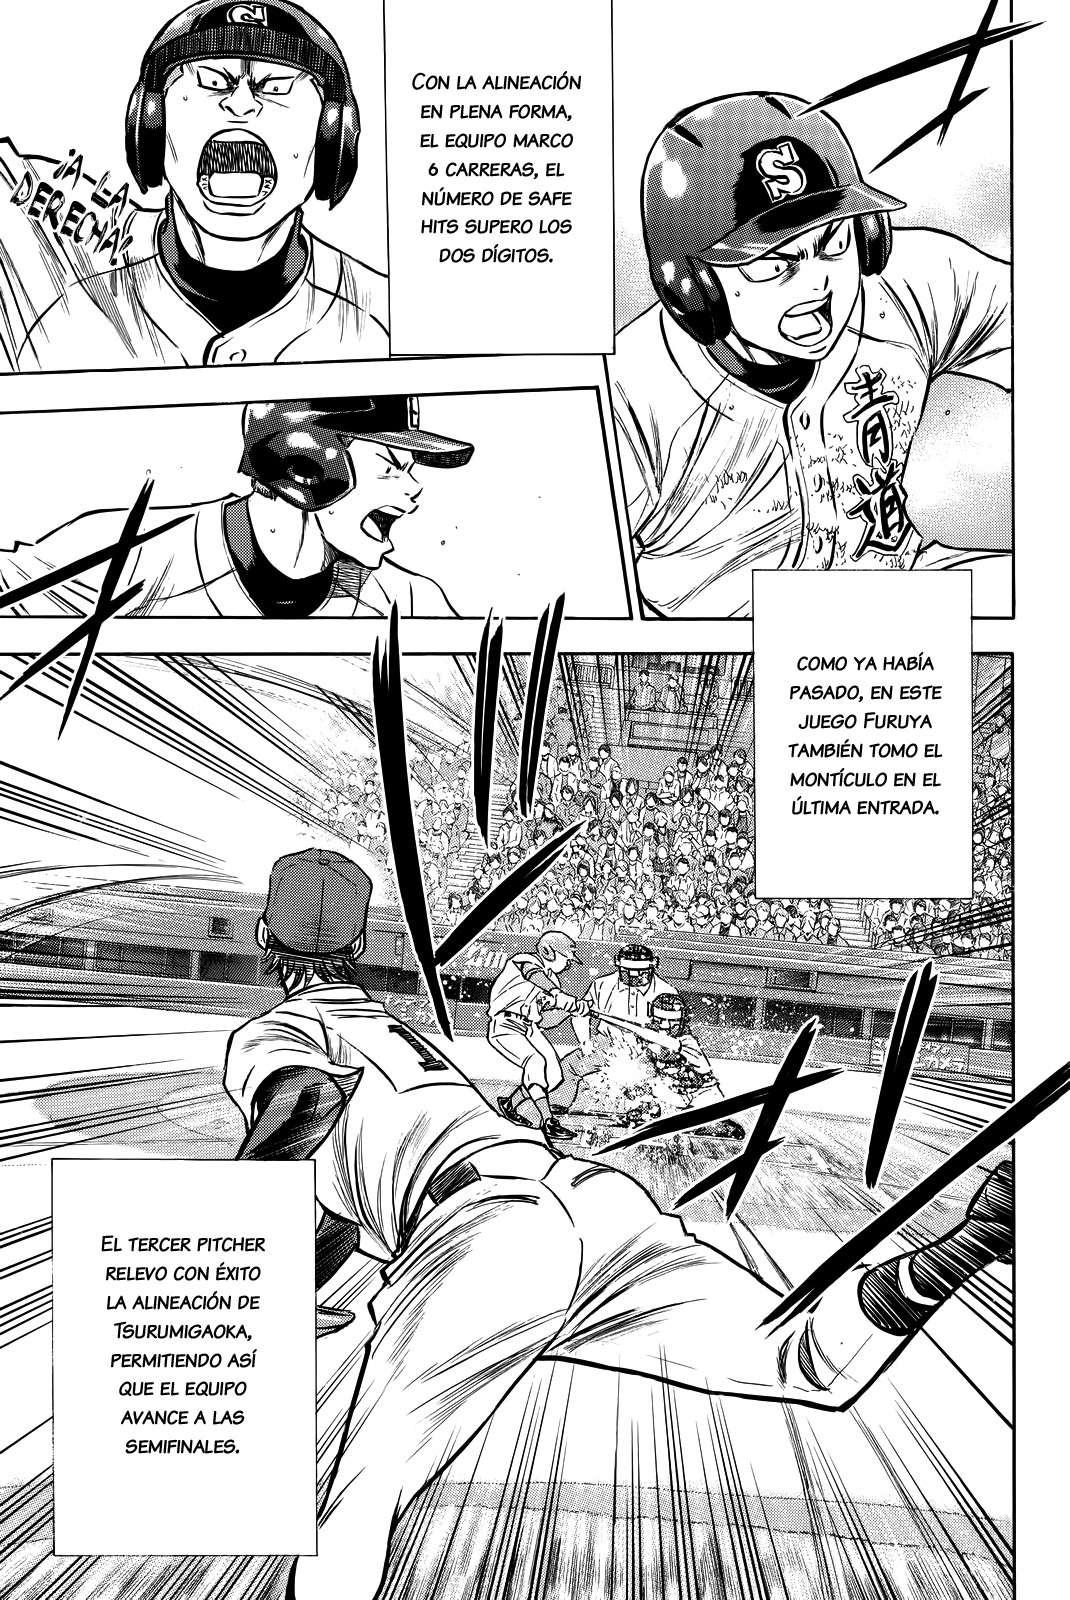 http://c5.ninemanga.com/es_manga/24/1752/430810/4727f0374aade12bd9aadd3bd311606a.jpg Page 7